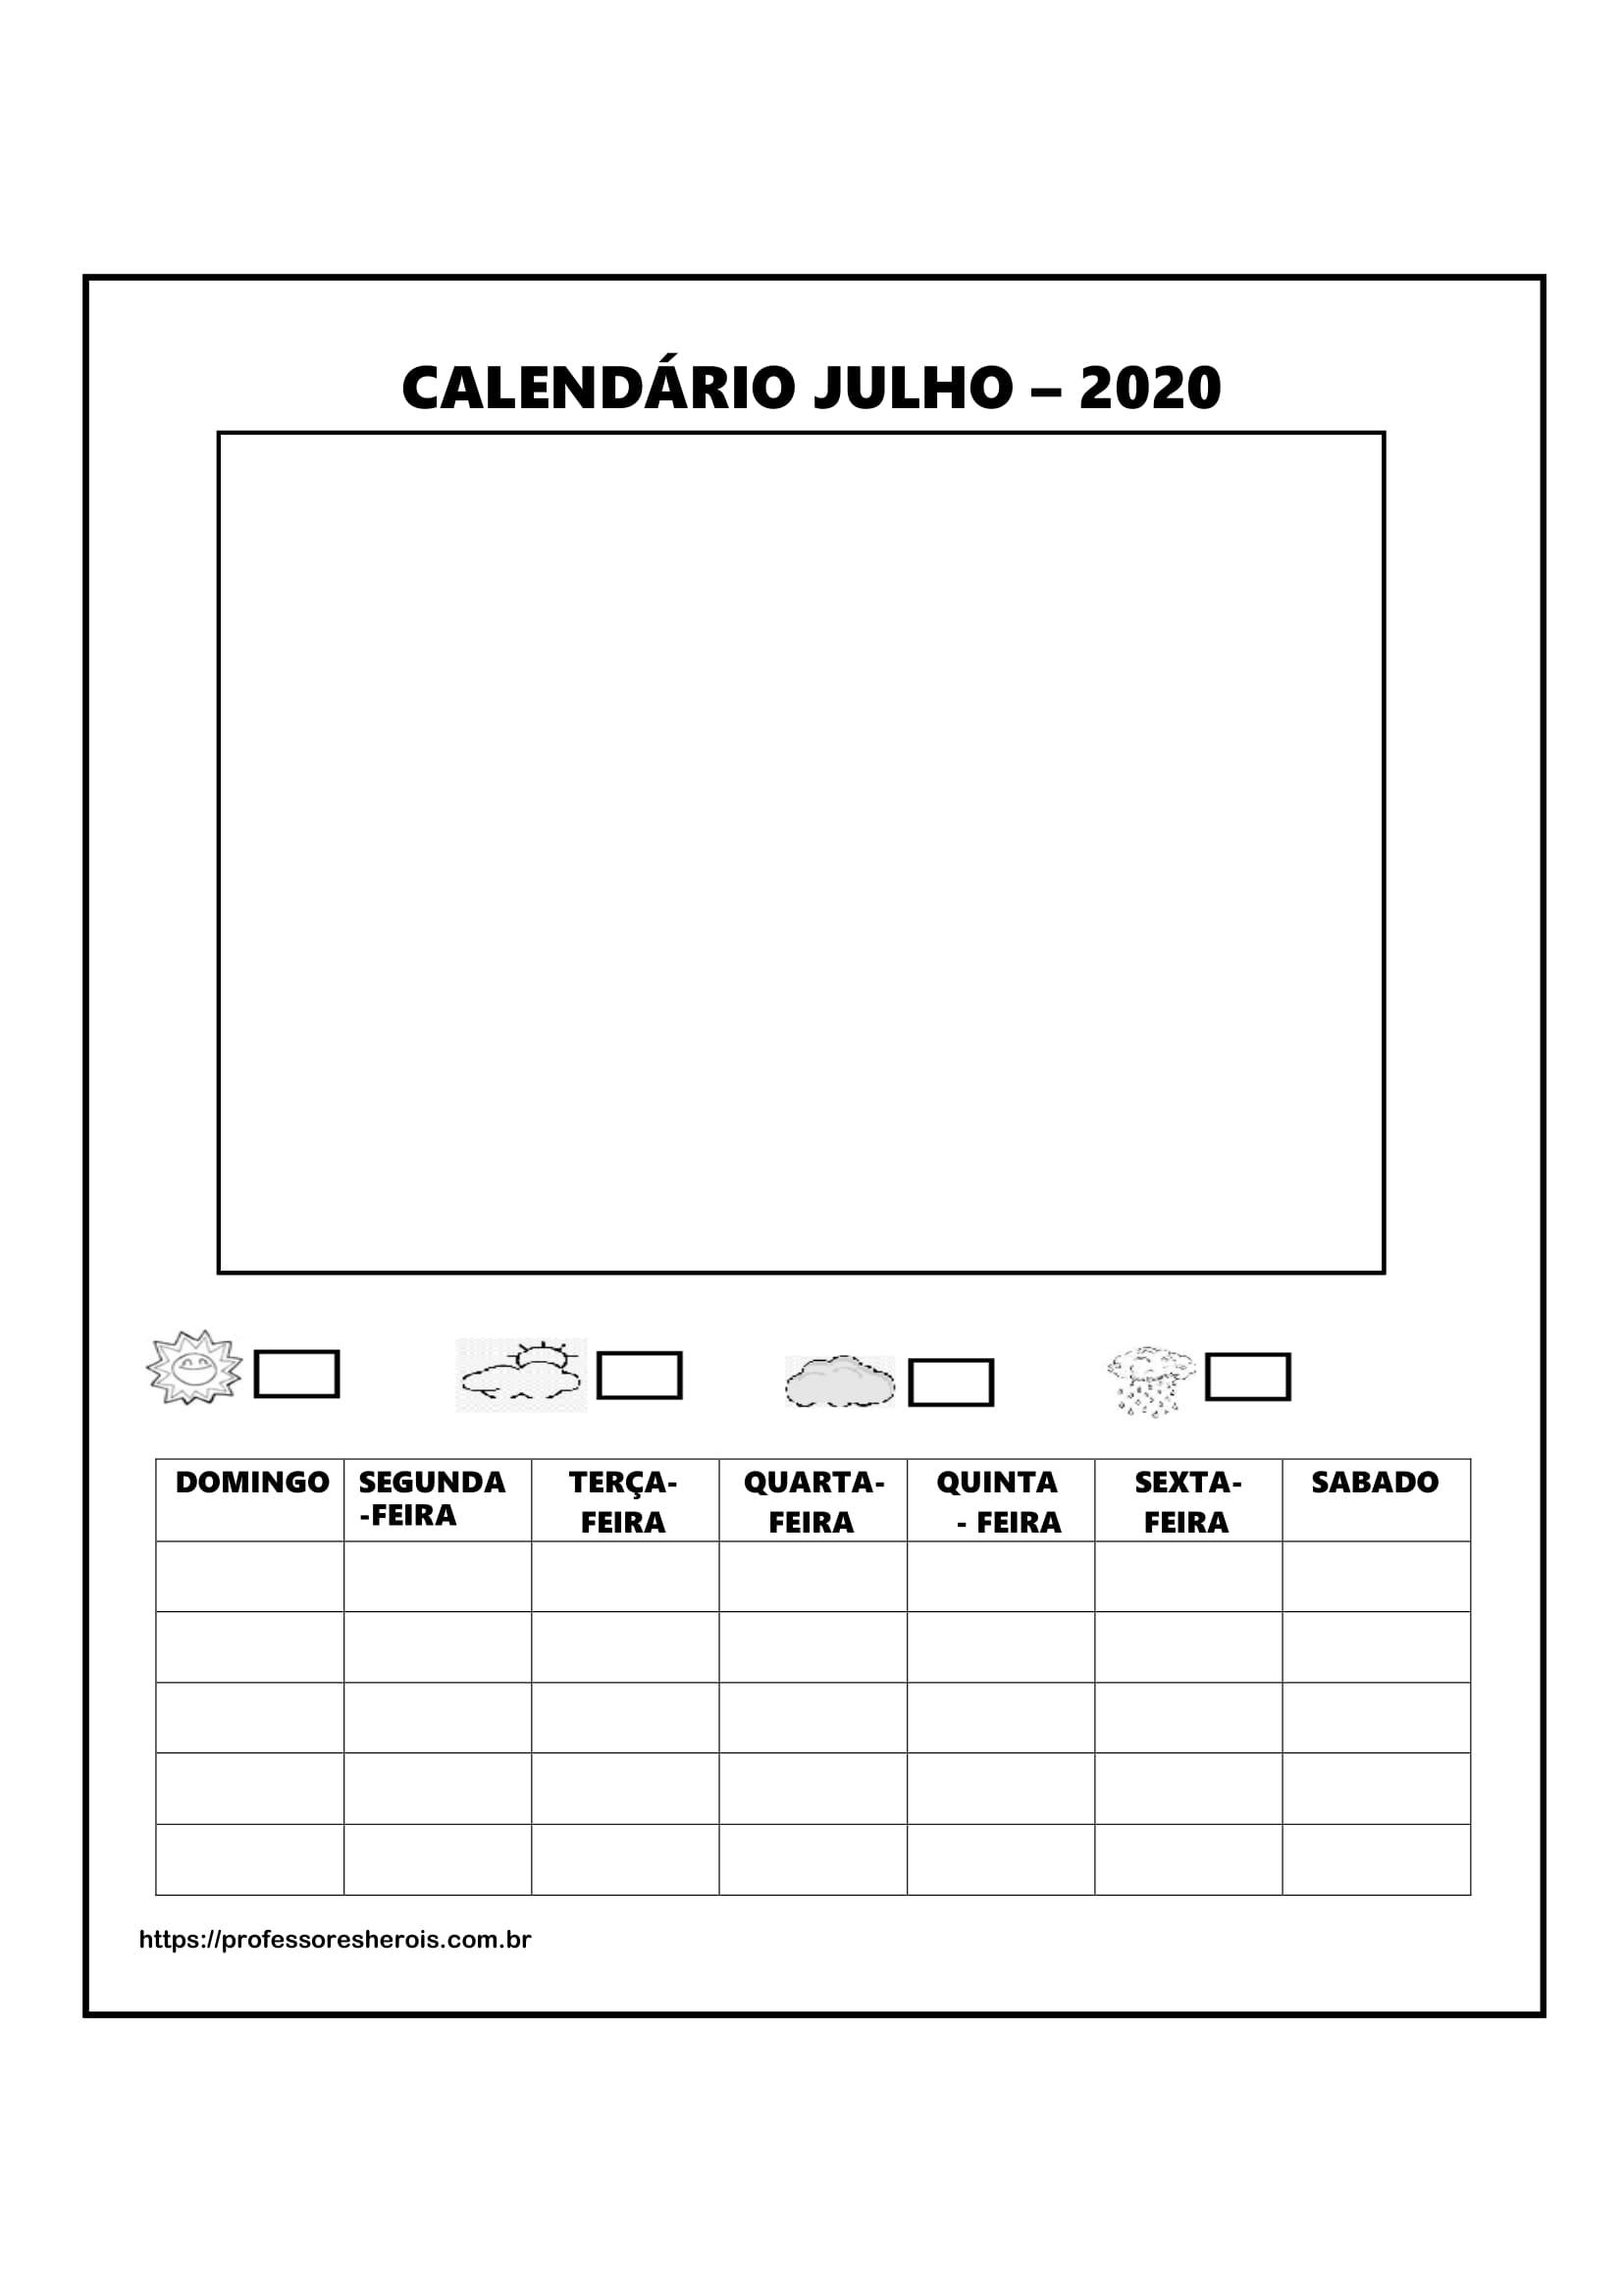 calendario_2020_mes_julho_imprimir_colorir_e_completar-14